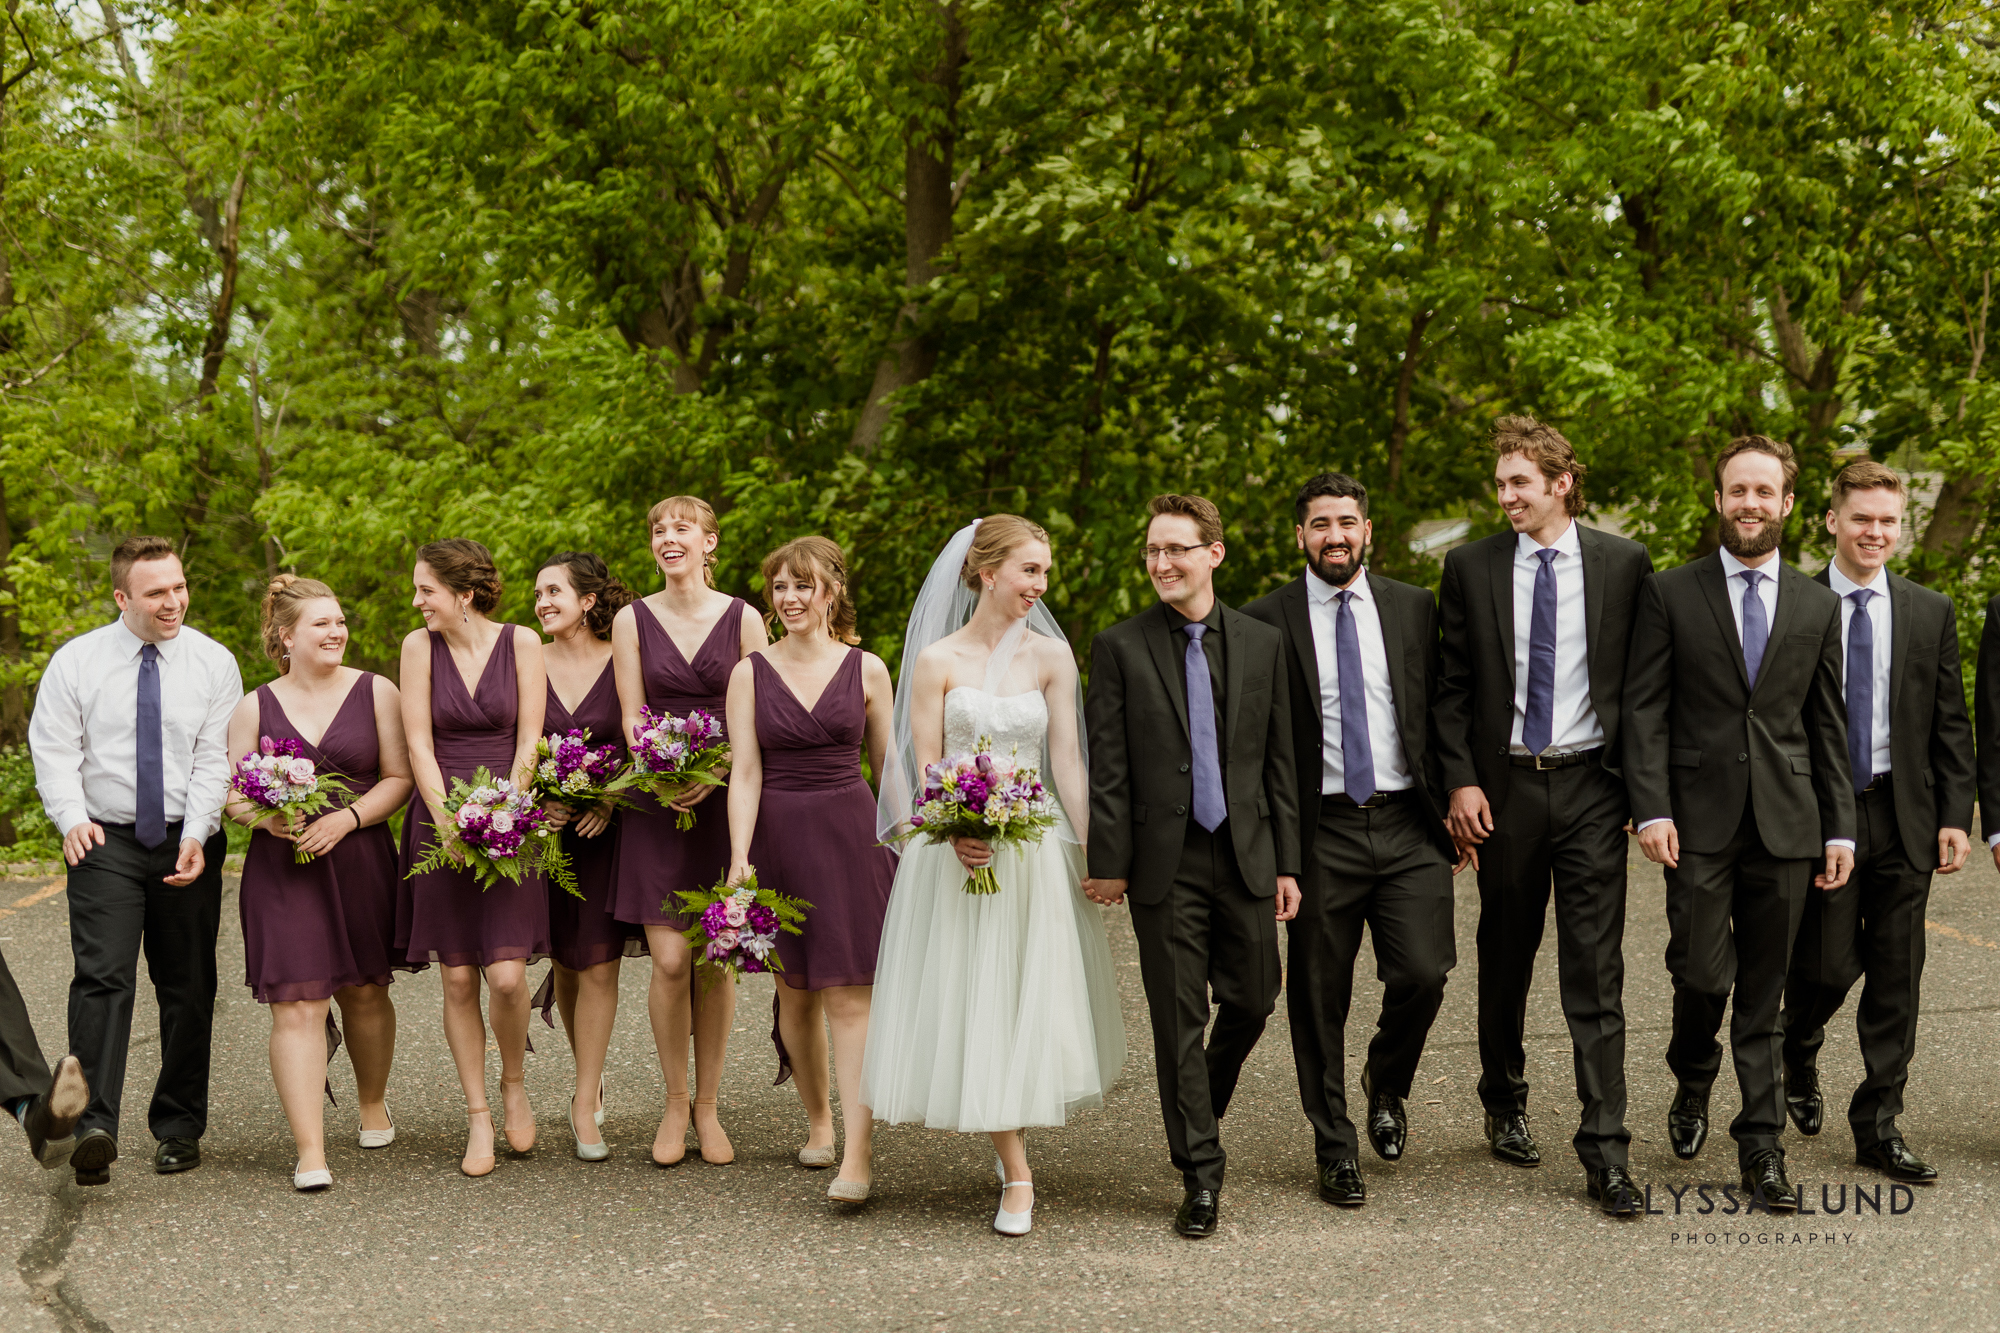 Lowell Inn Stillwater Wedding Photography-27.jpg